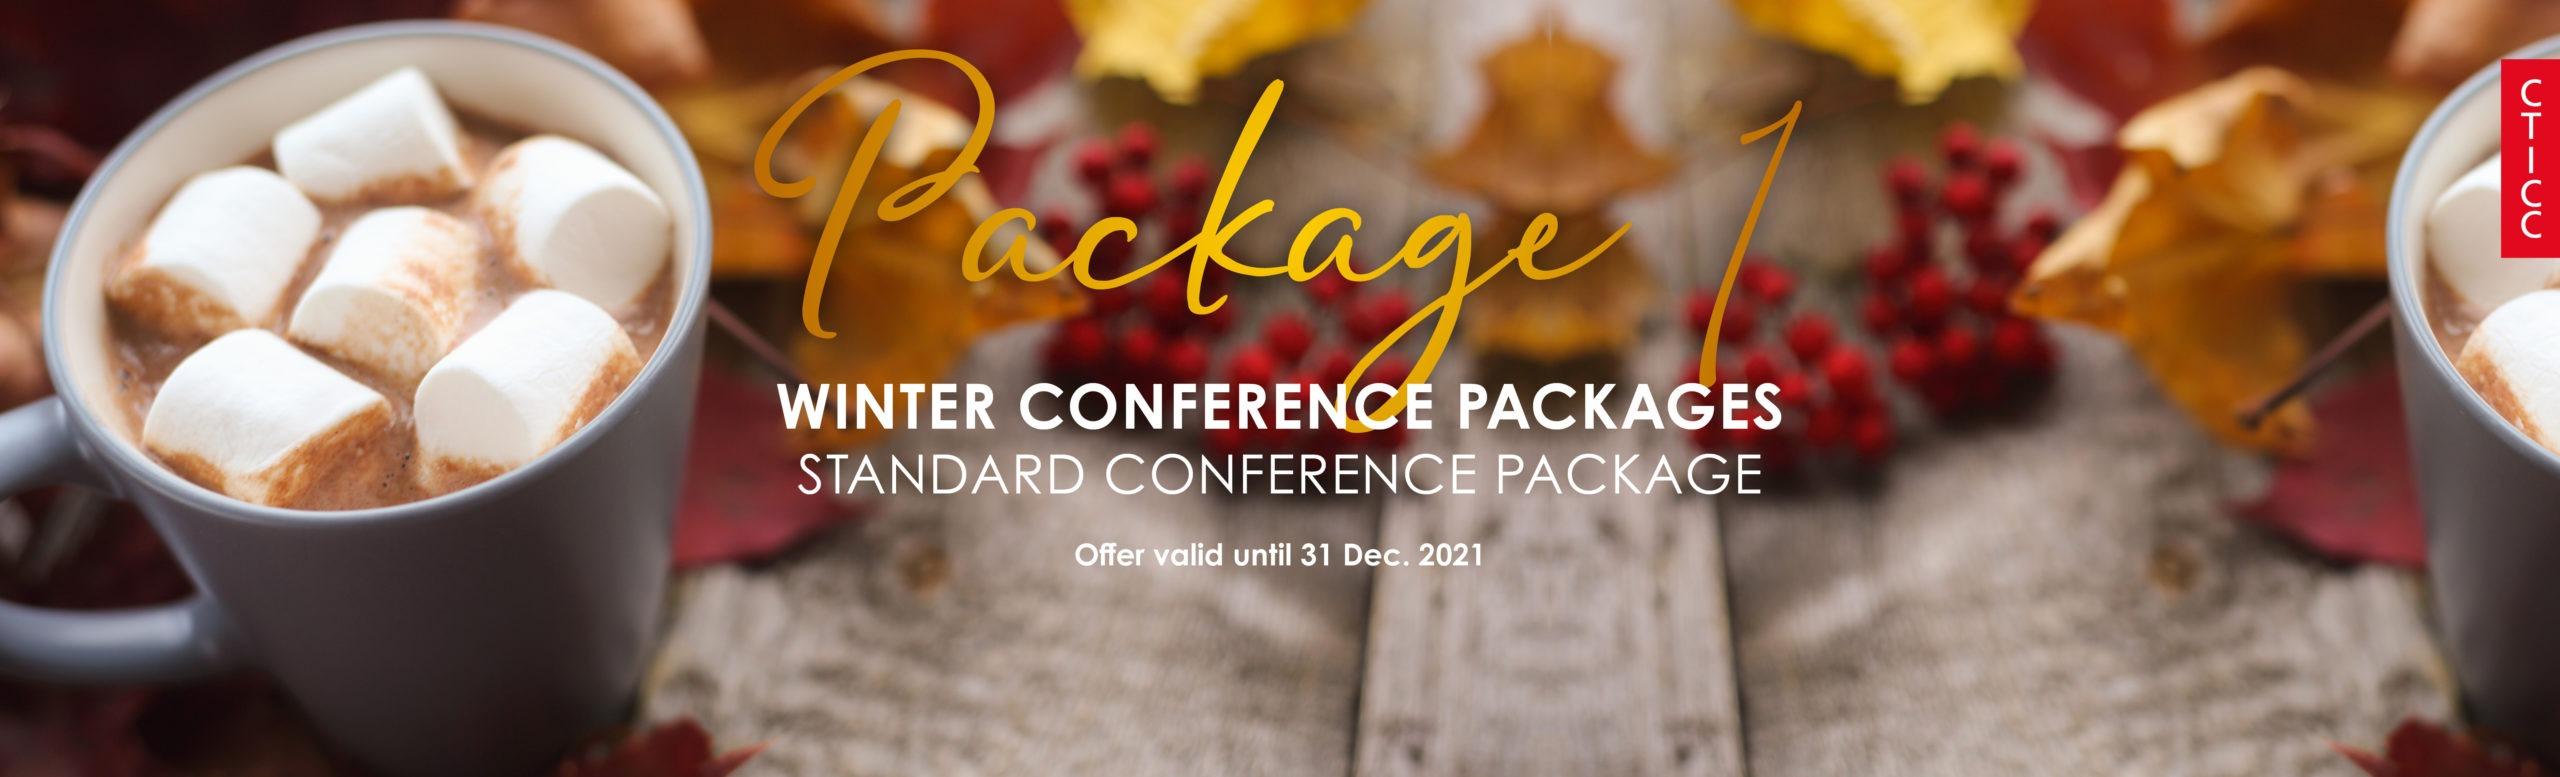 CTICC Winter Conference